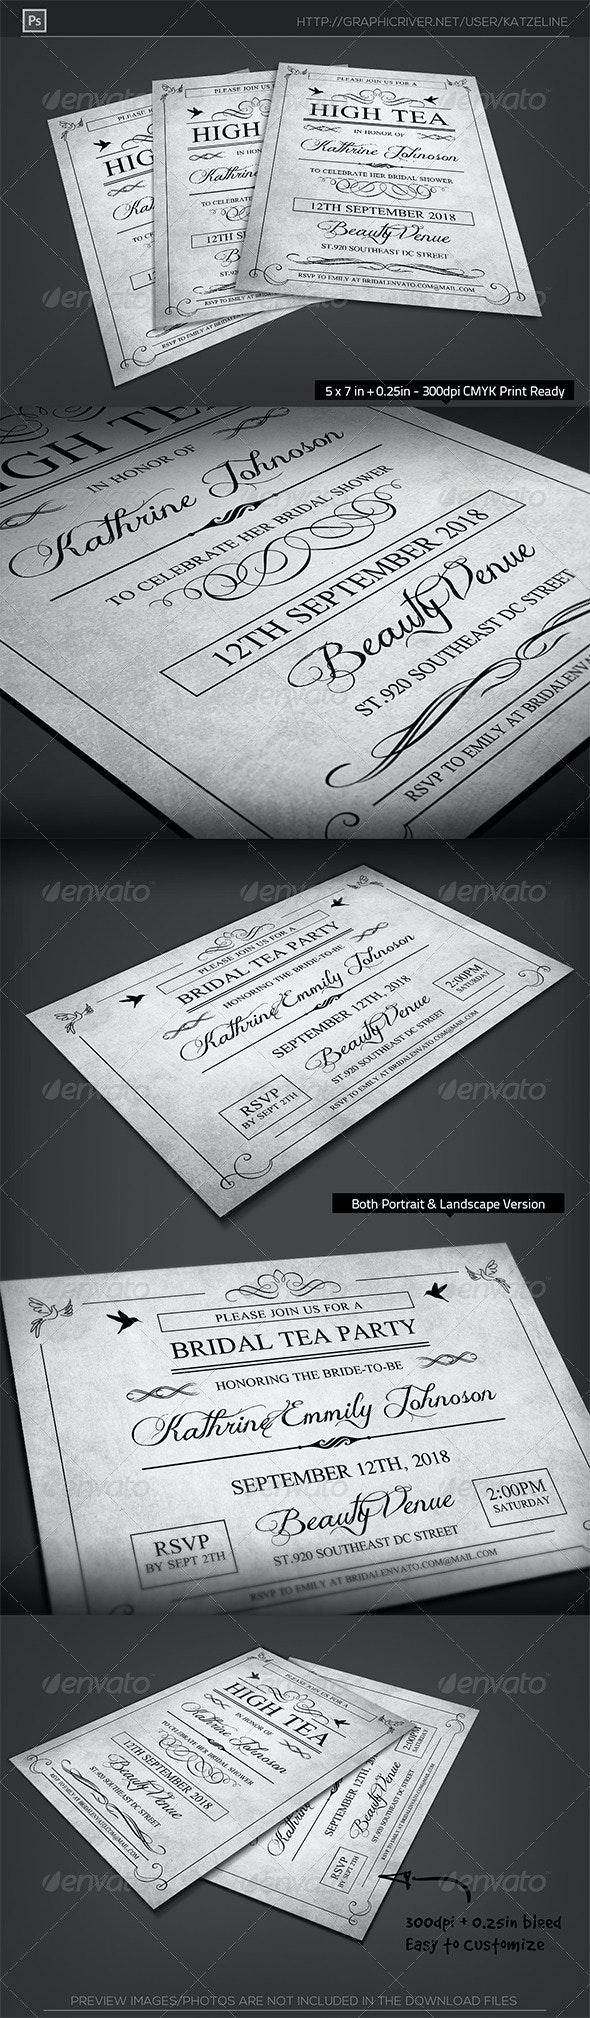 High Tea Bridal Shower Party Invitation Template - Invitations Cards & Invites